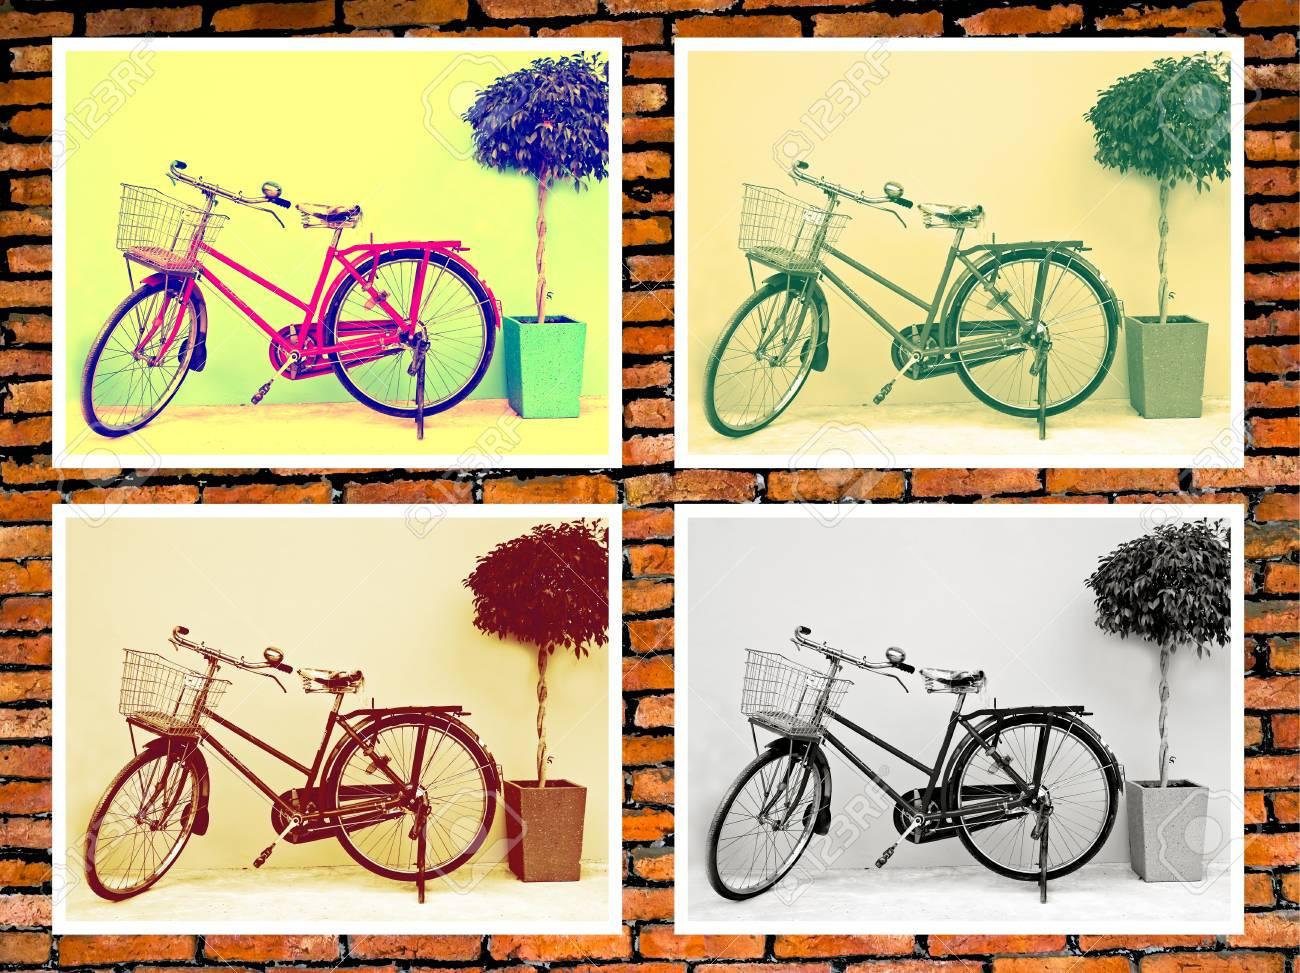 Classic Bicycle Photo On Brick Wall. Home Decor Ideas. Stock Photo ...